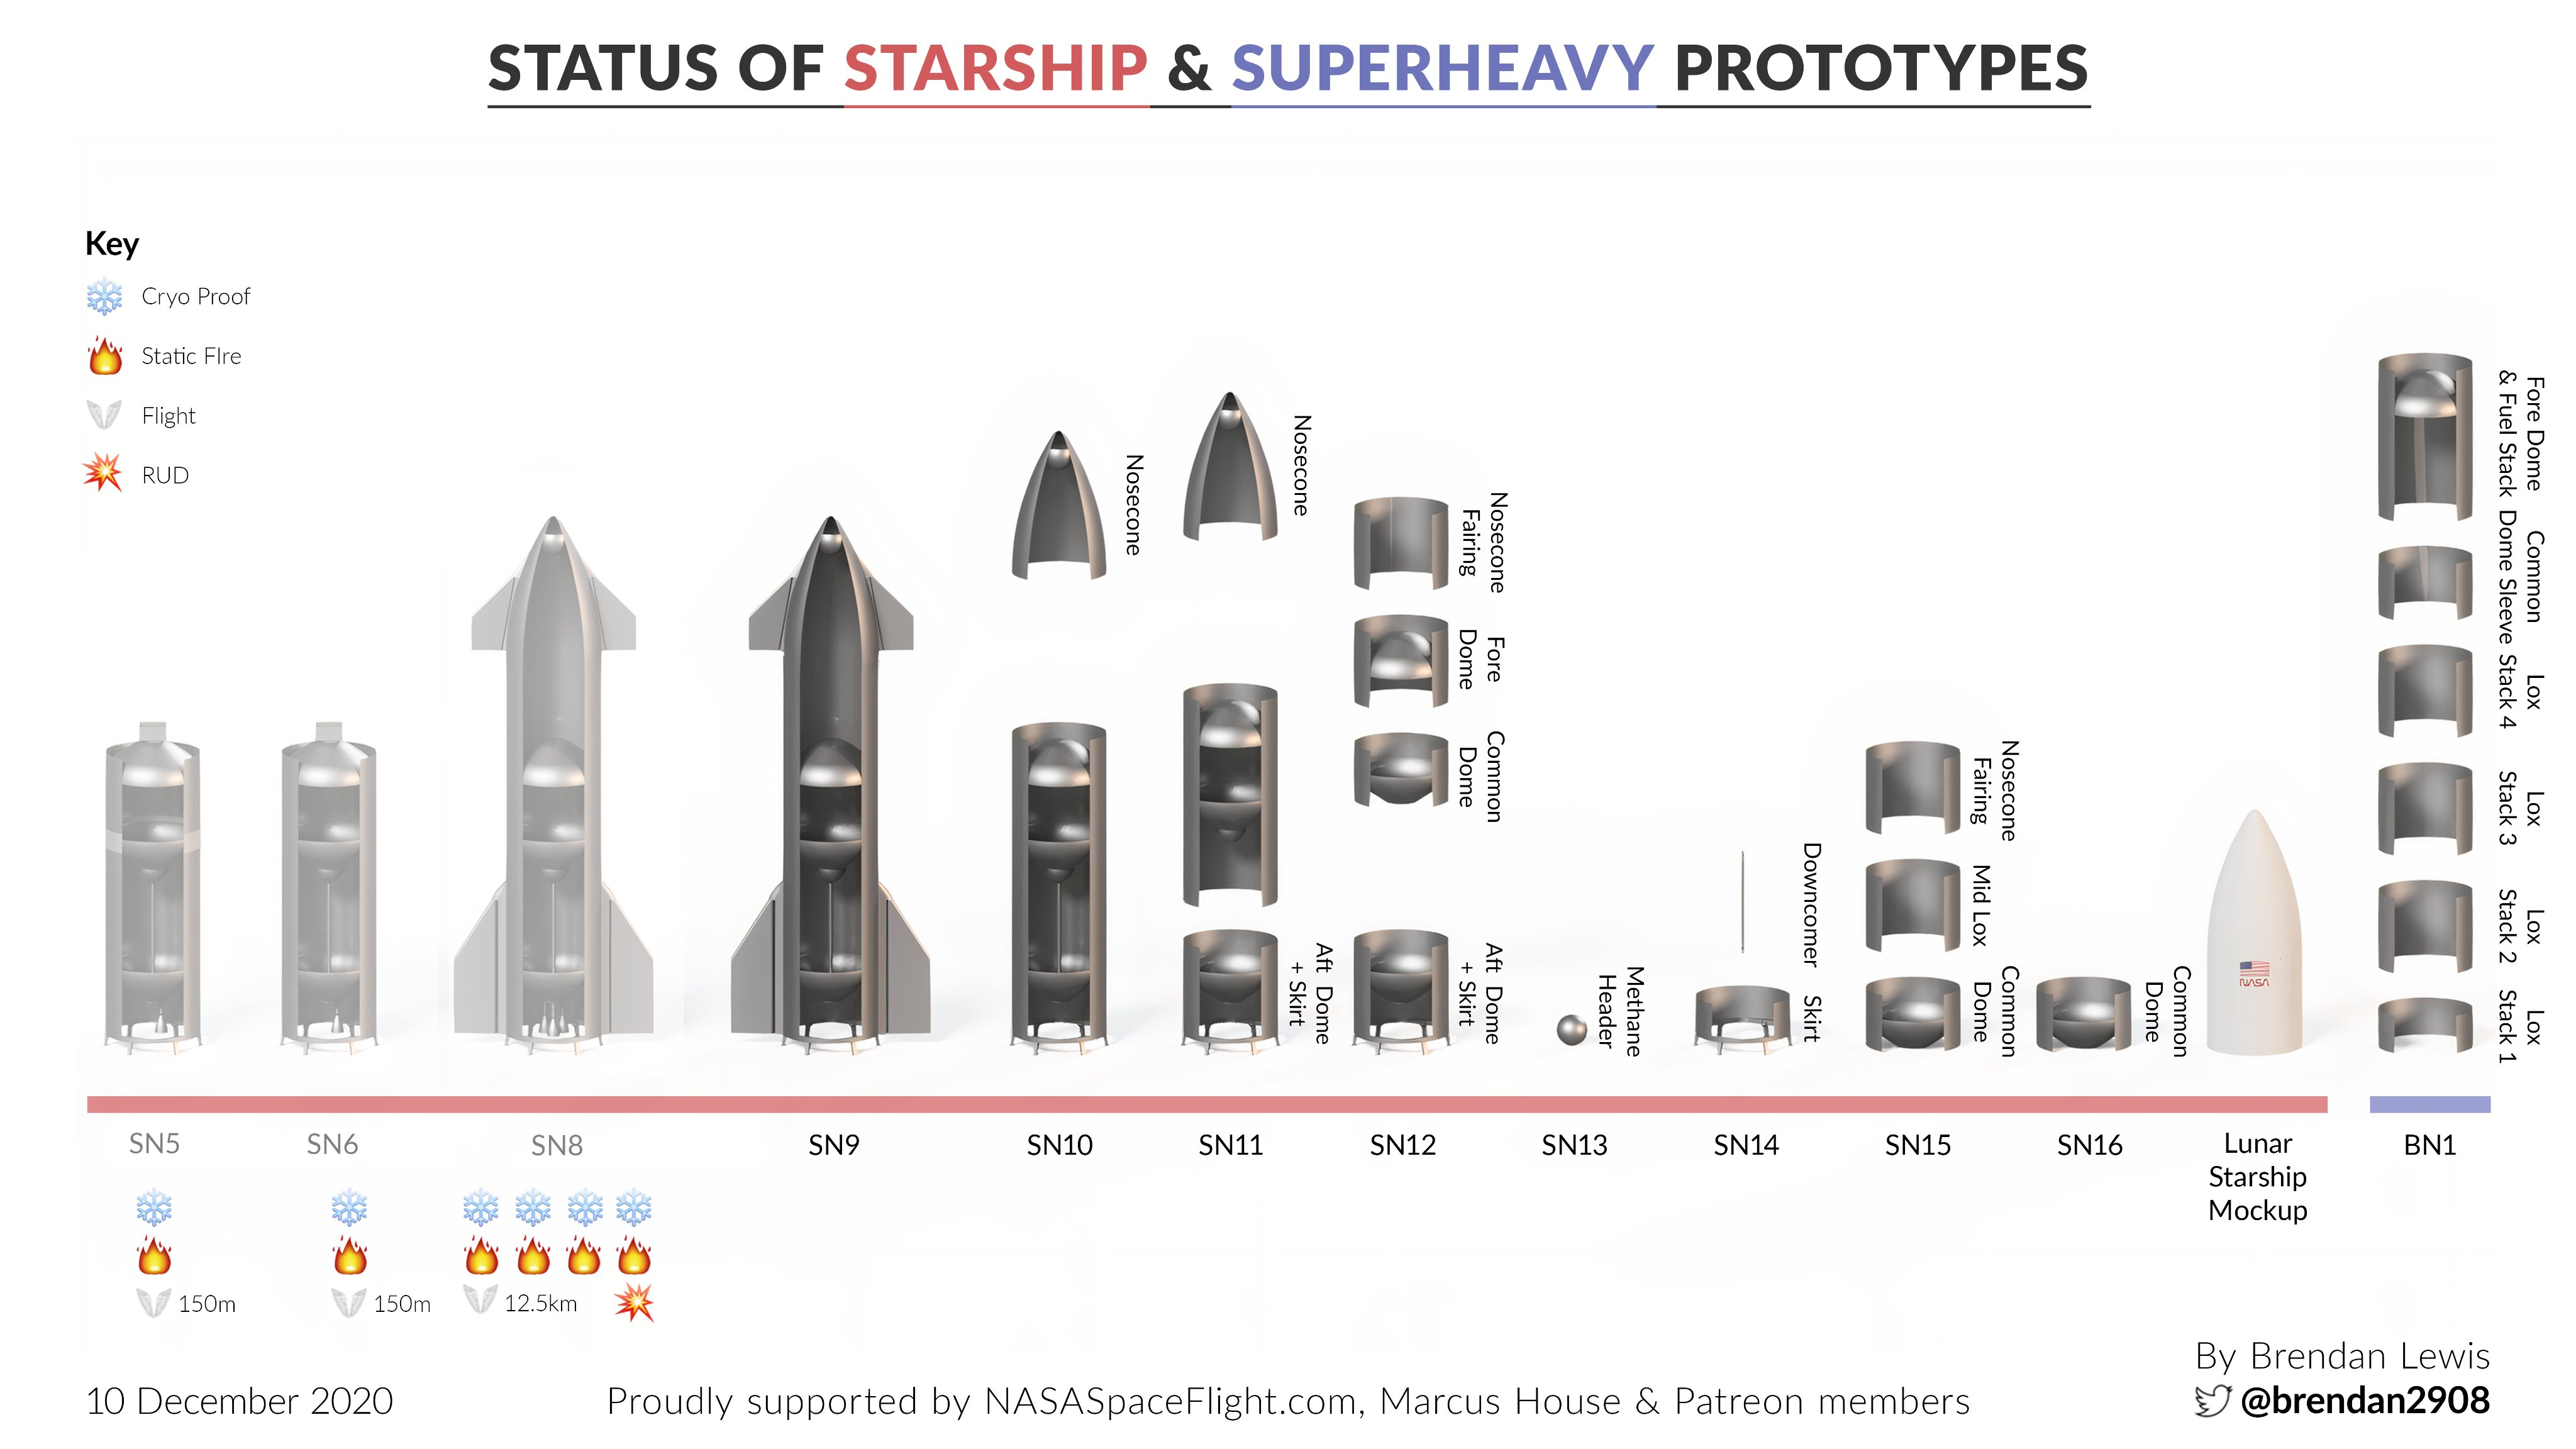 Point de situation des Starship & Superheavy 11655